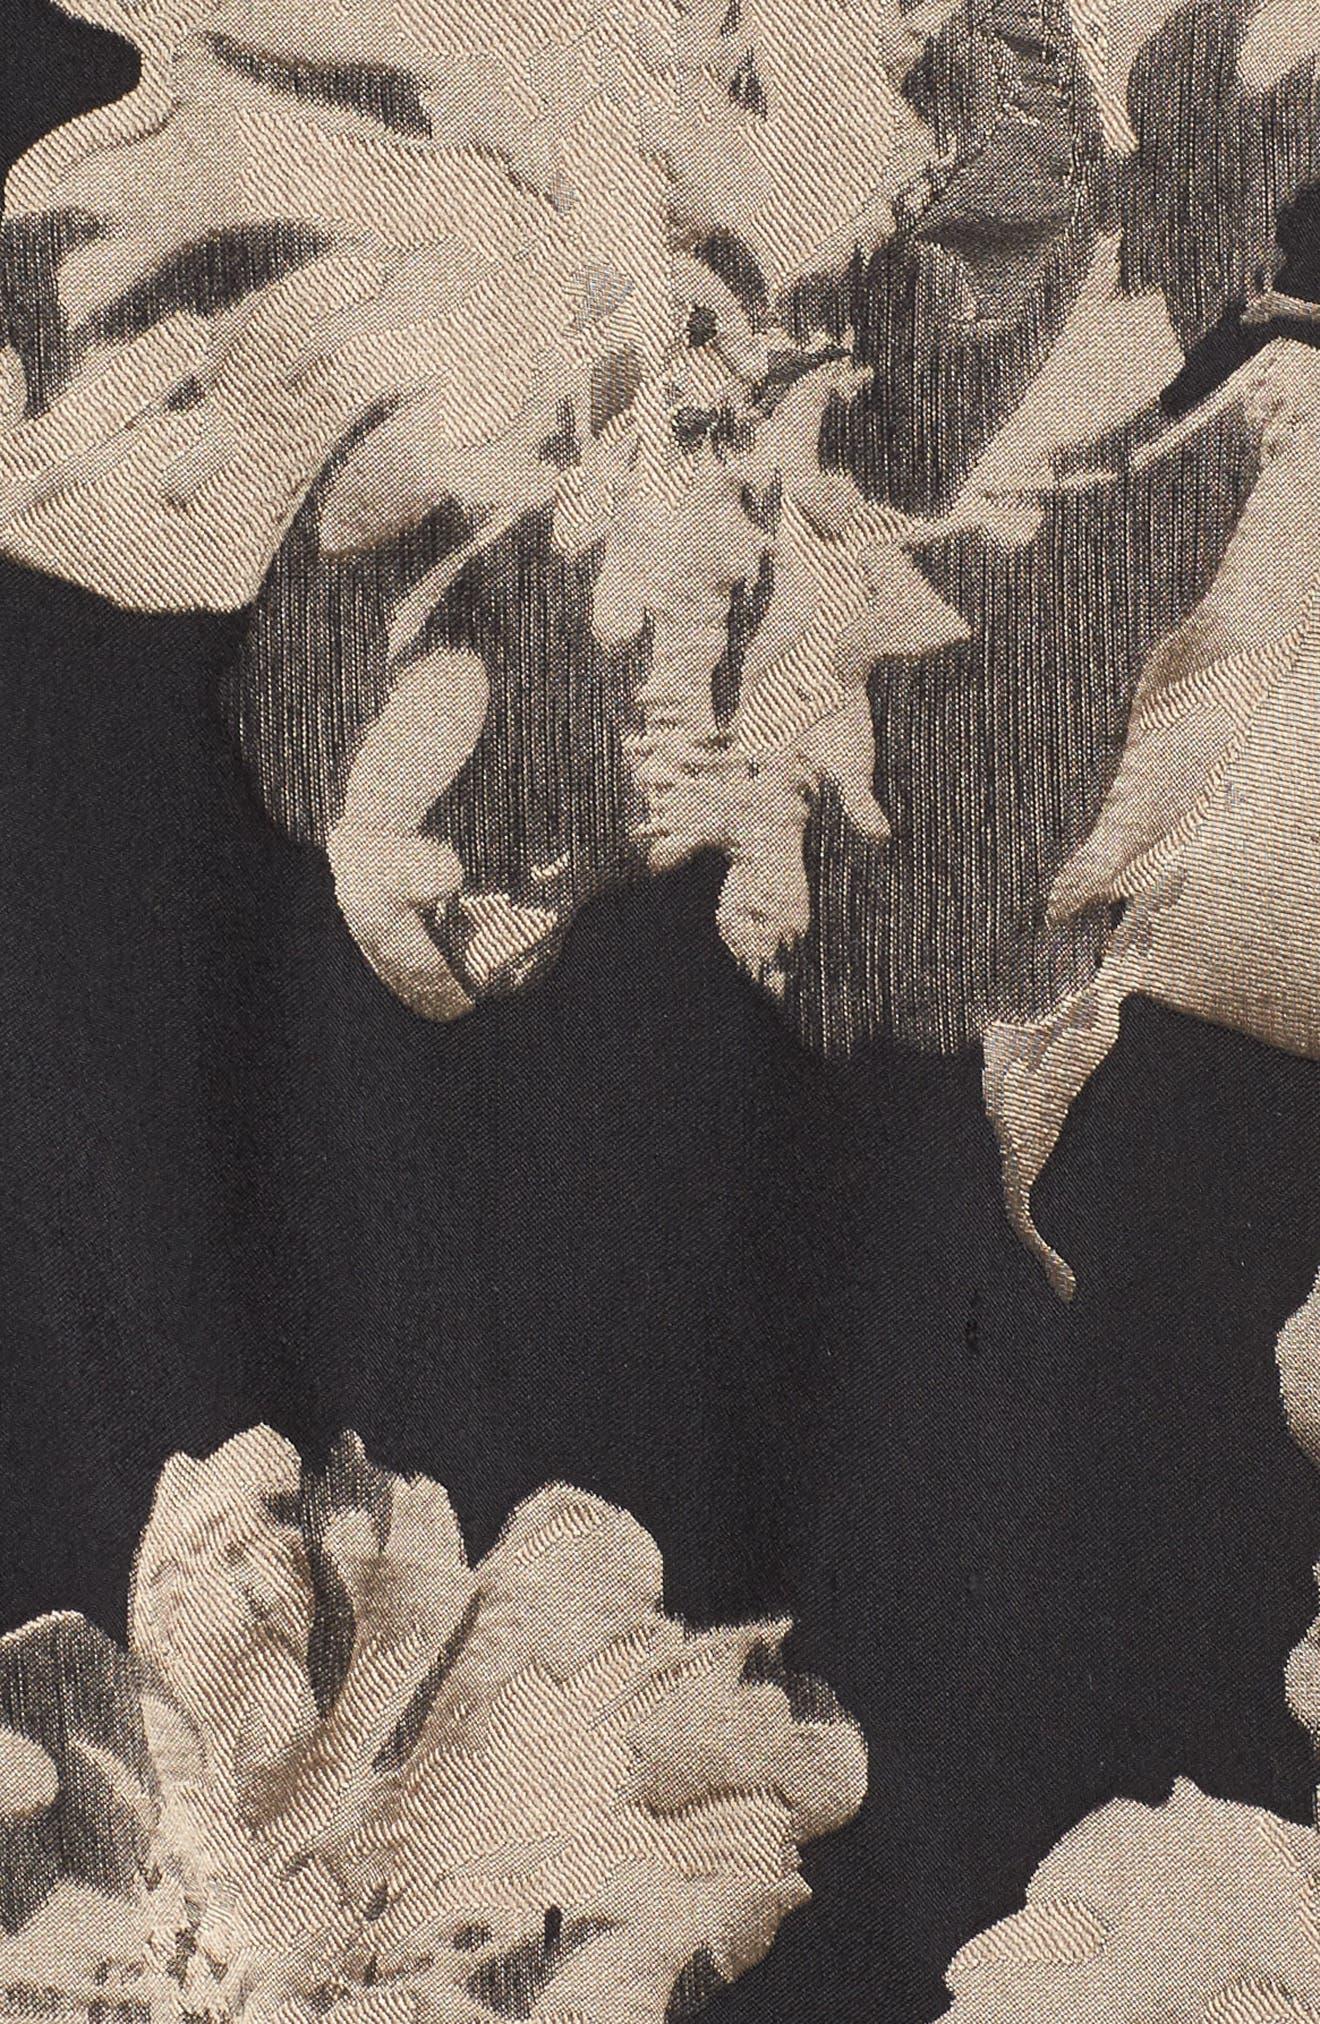 Mesh Waist High/Low Brocade Dress,                             Alternate thumbnail 5, color,                             Black/ Champagne